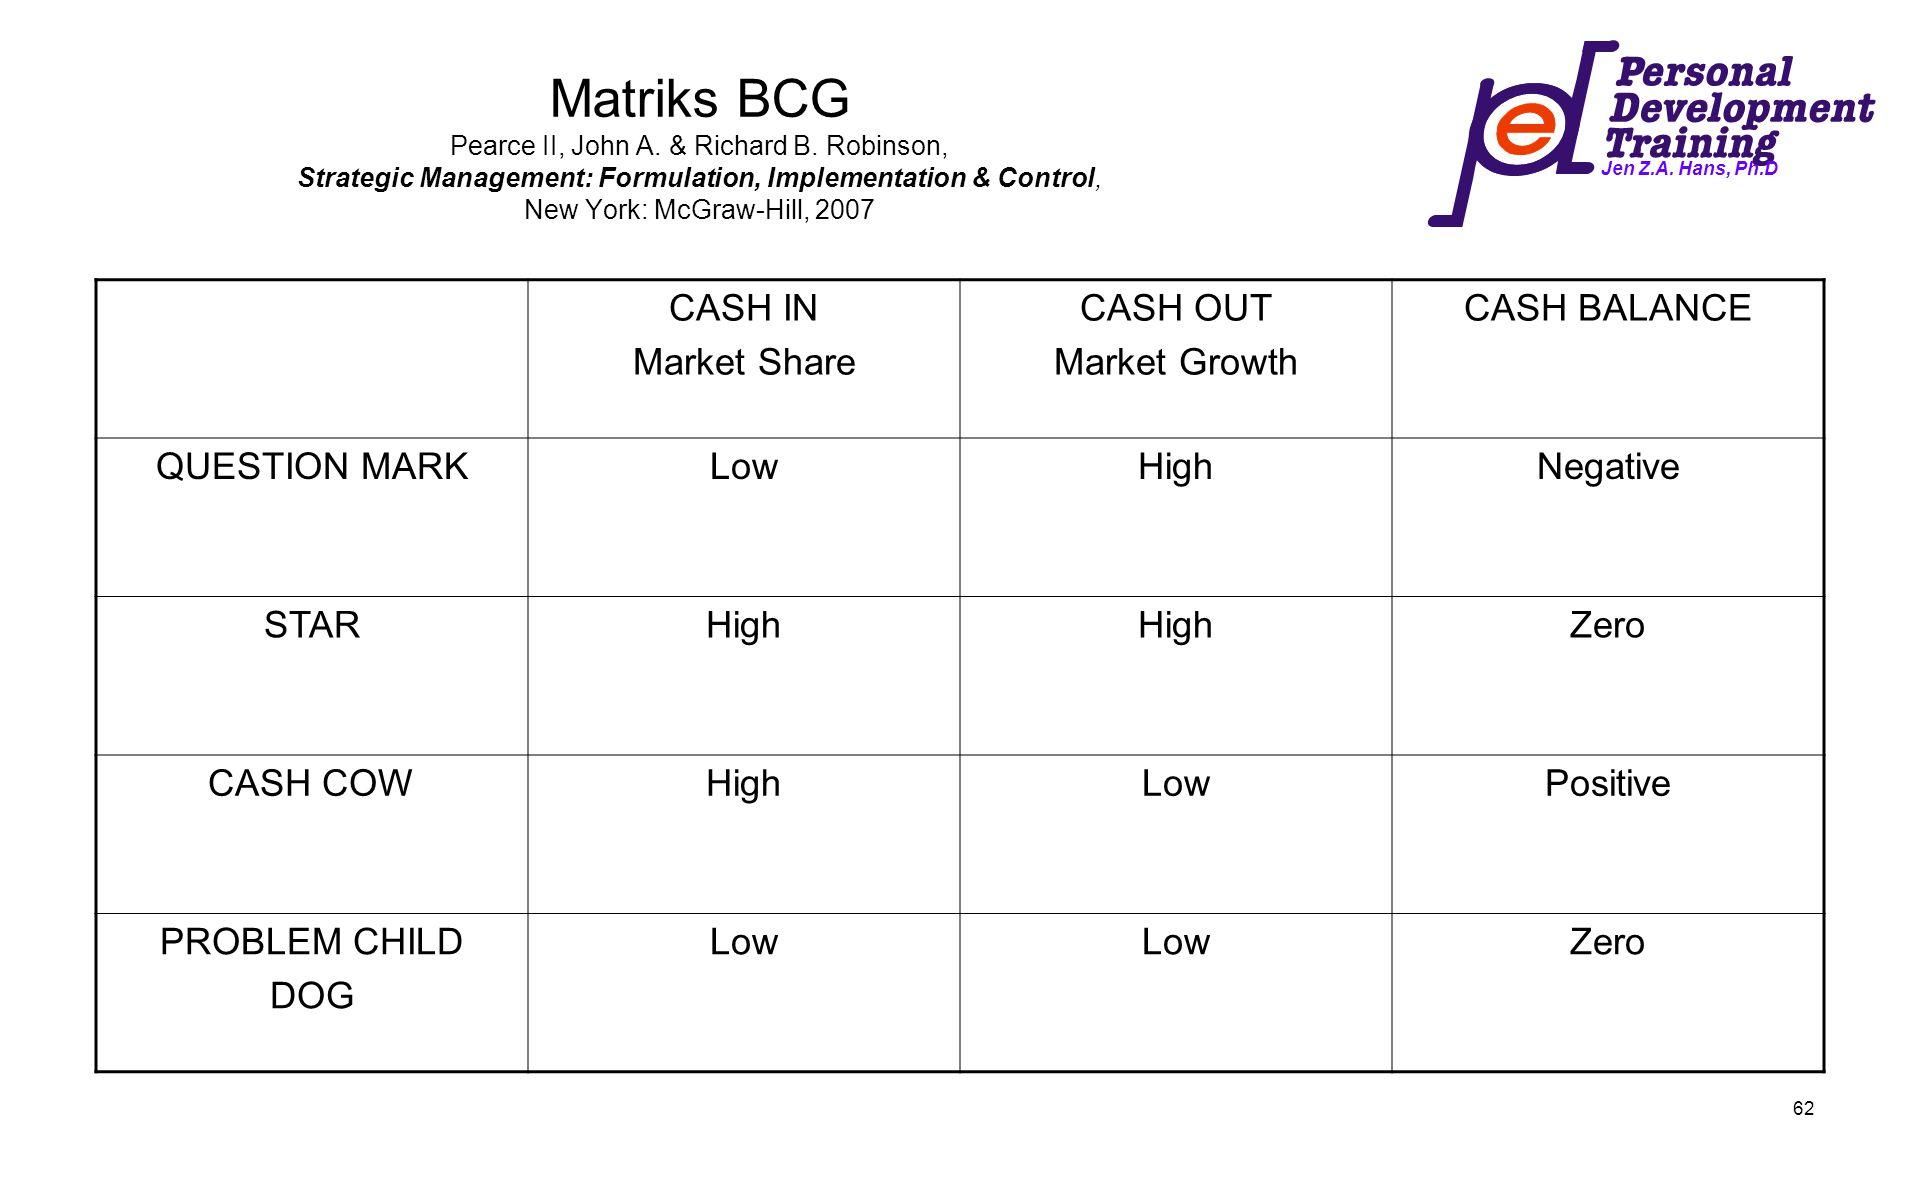 Jen Z.A. Hans, Ph.D 62 Matriks BCG Pearce II, John A. & Richard B. Robinson, Strategic Management: Formulation, Implementation & Control, New York: Mc